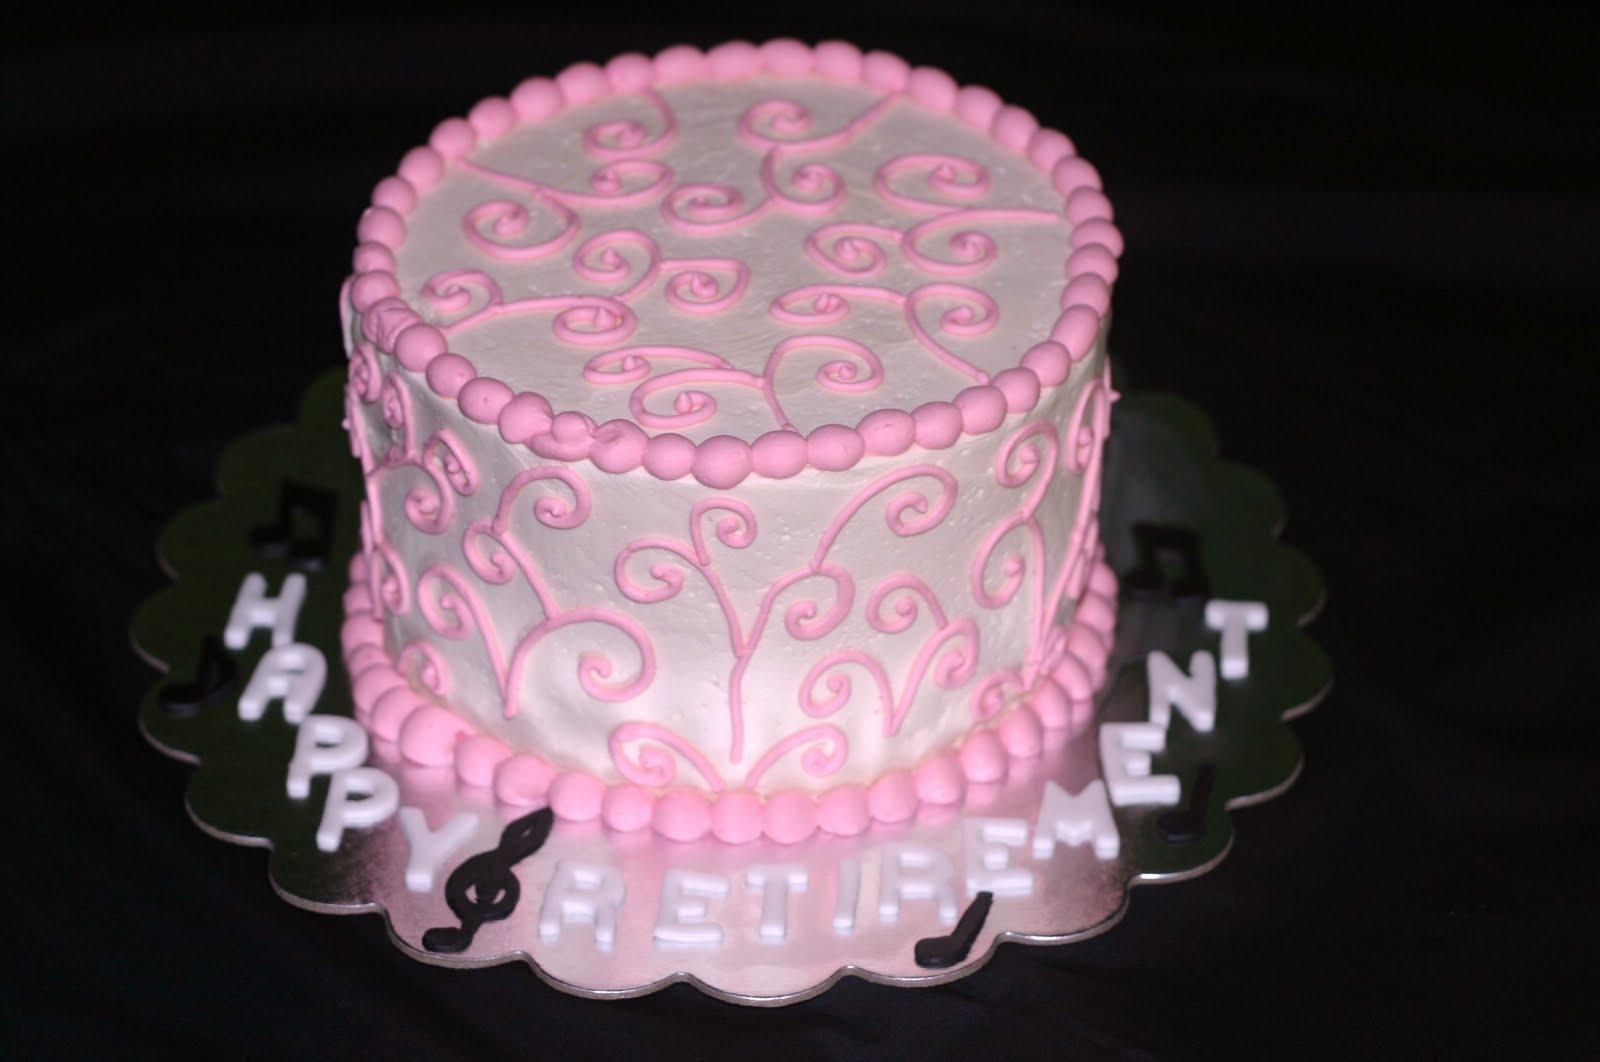 cake ideas on pinterest retirement cakes cake and christmas cakes